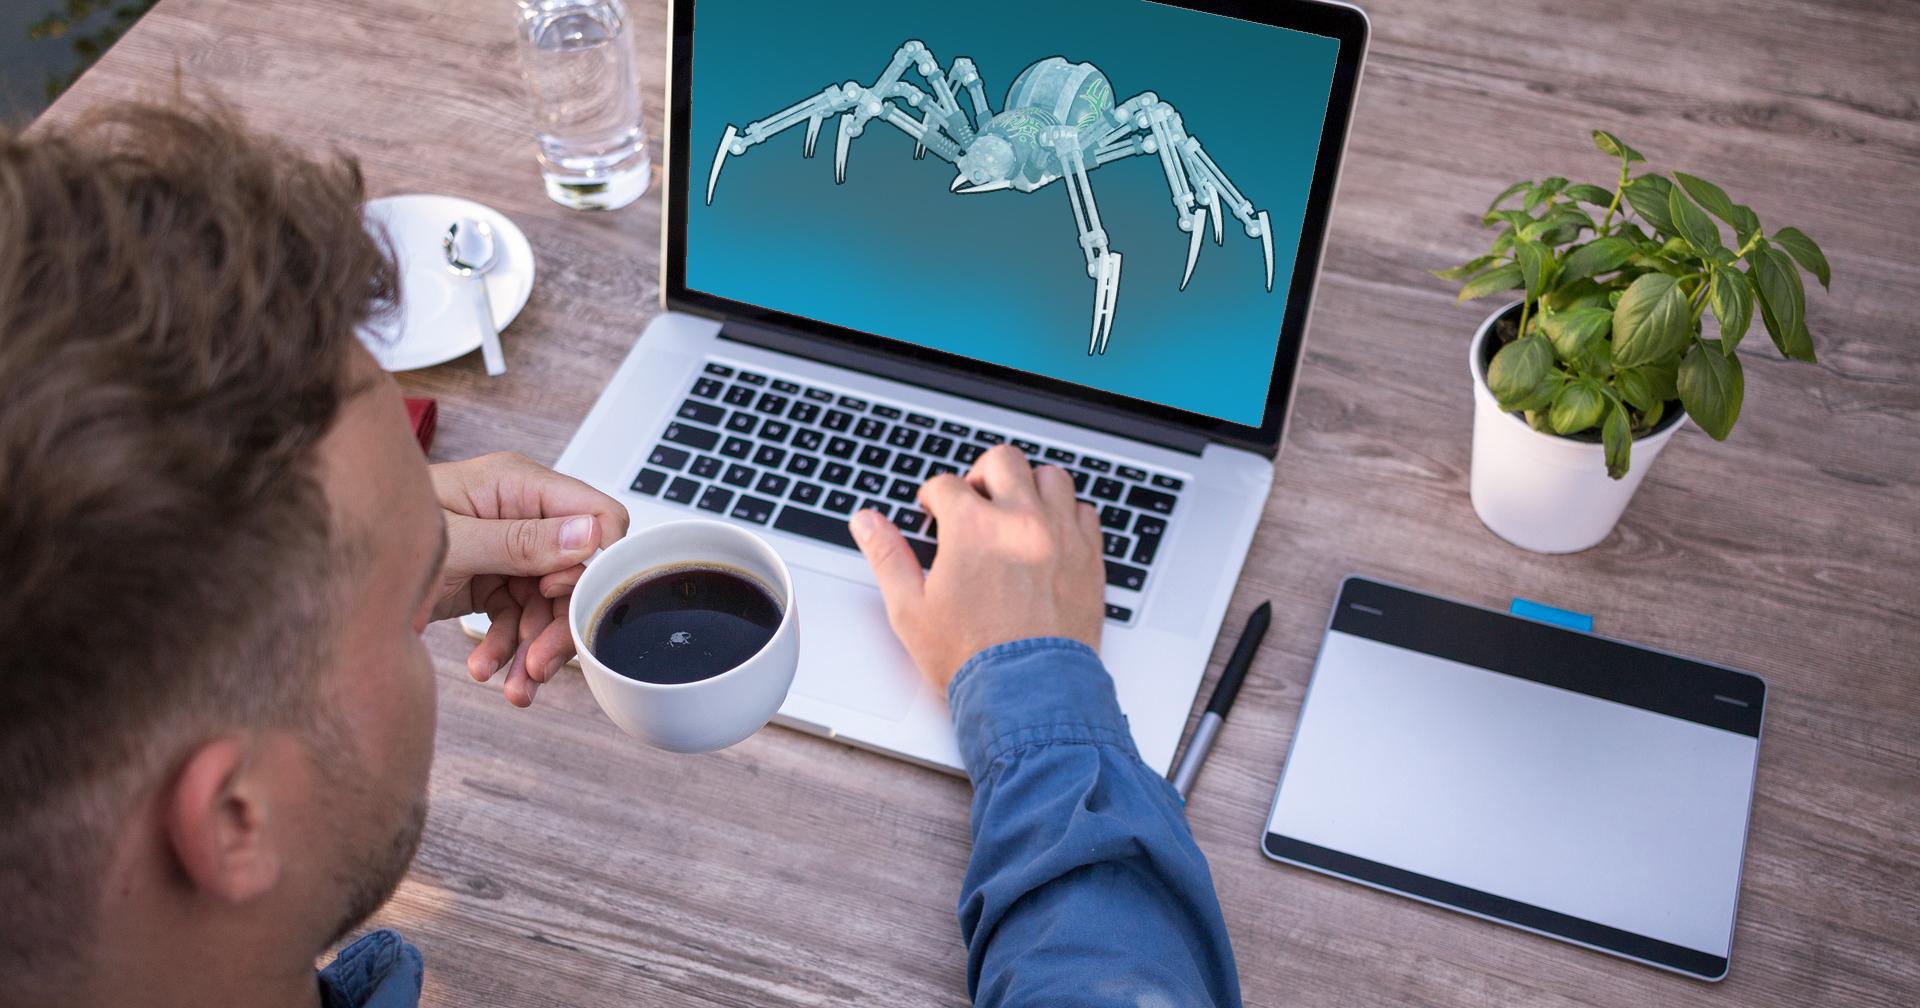 Robo-insectos: la naturaleza como inspiración para la robótica